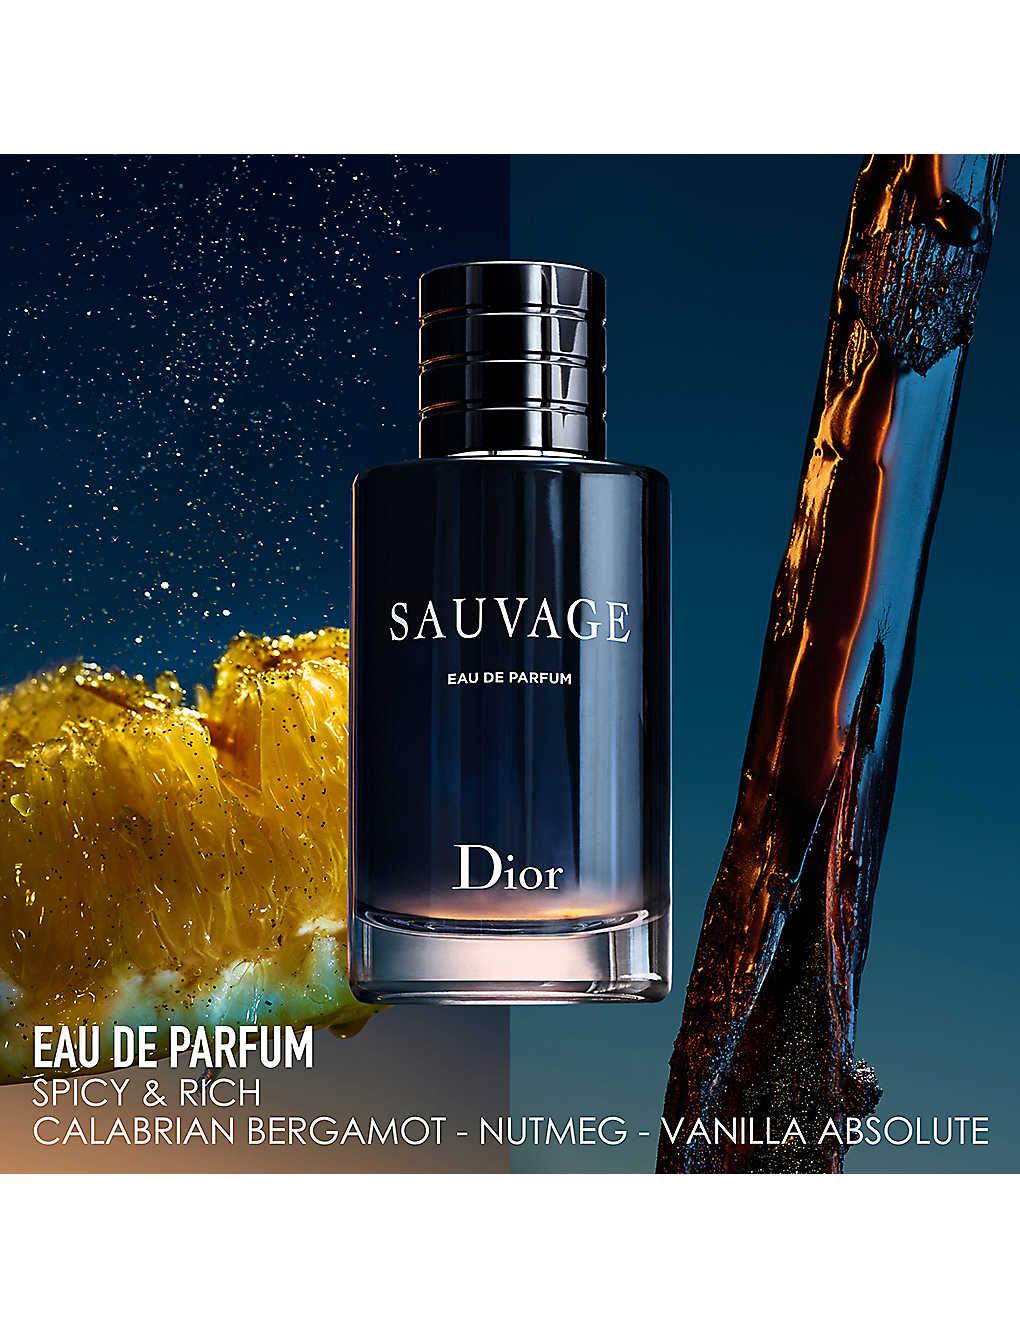 Dior Limited-Edition Dior Sauvage Eau de Parfum